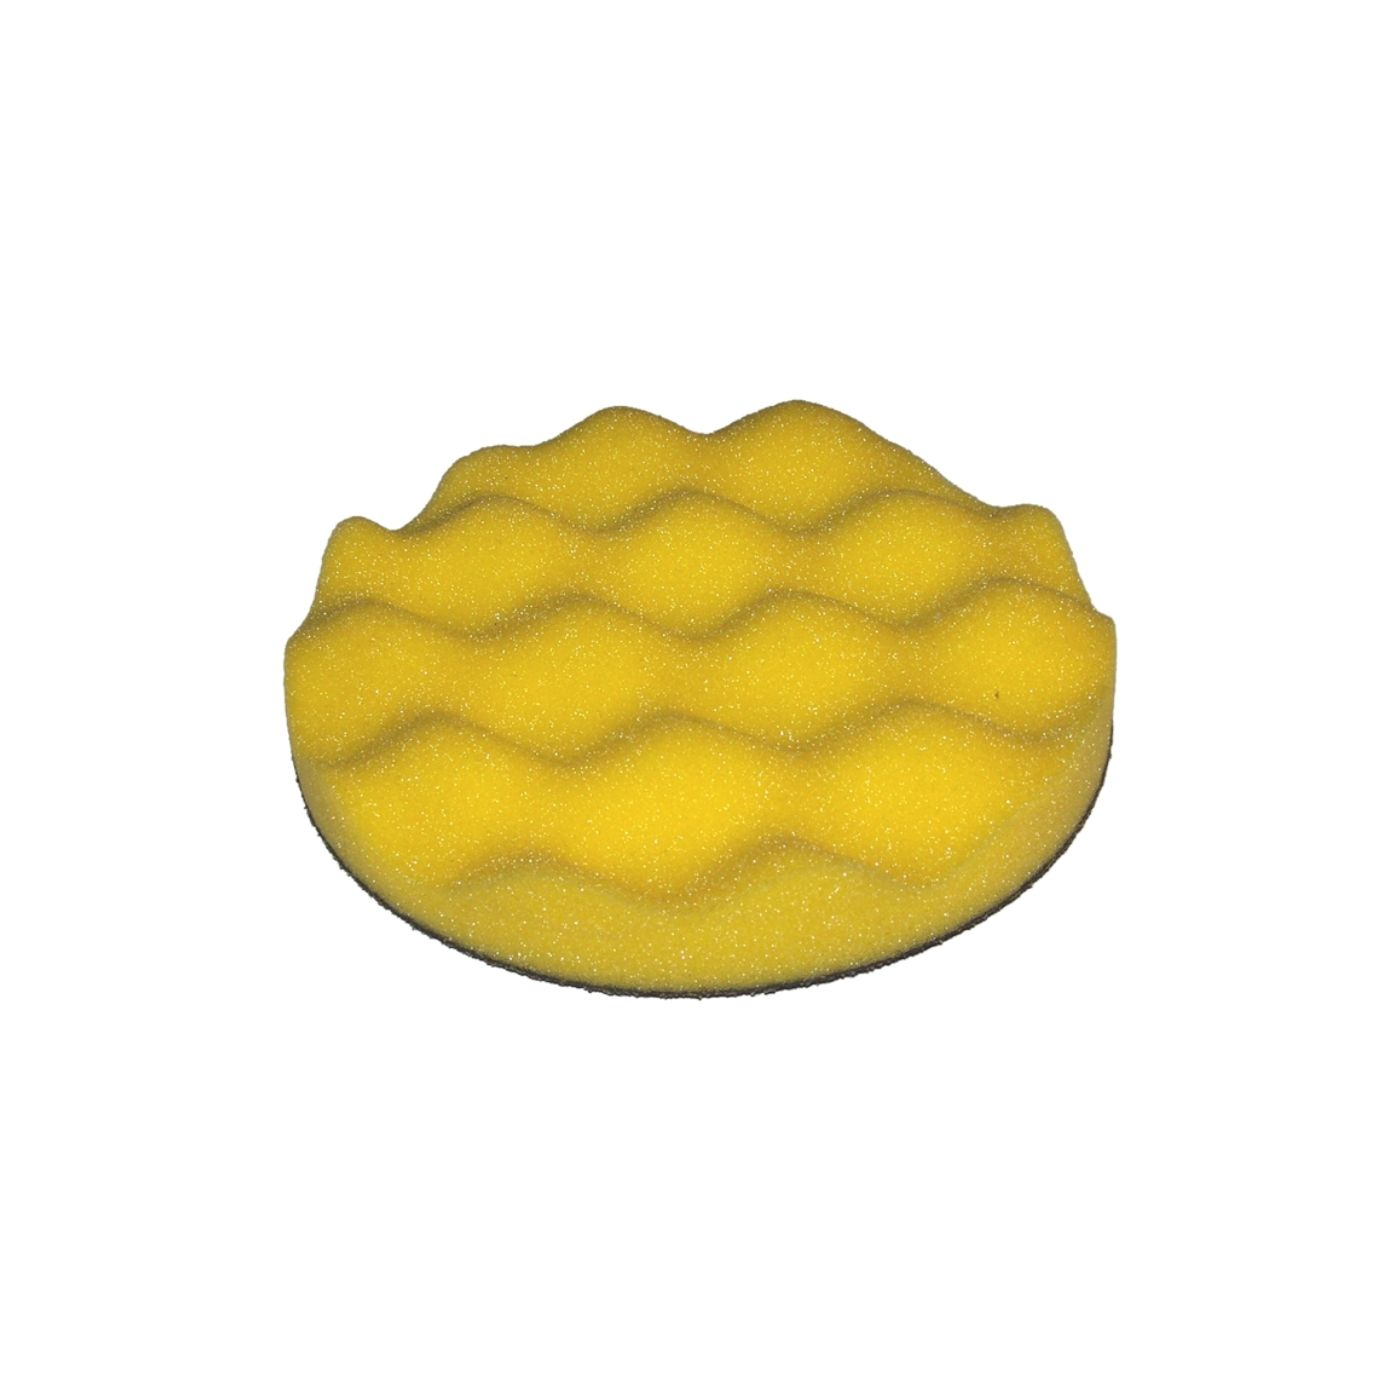 Skumrondell Turtle Wax, Våfflad Gul